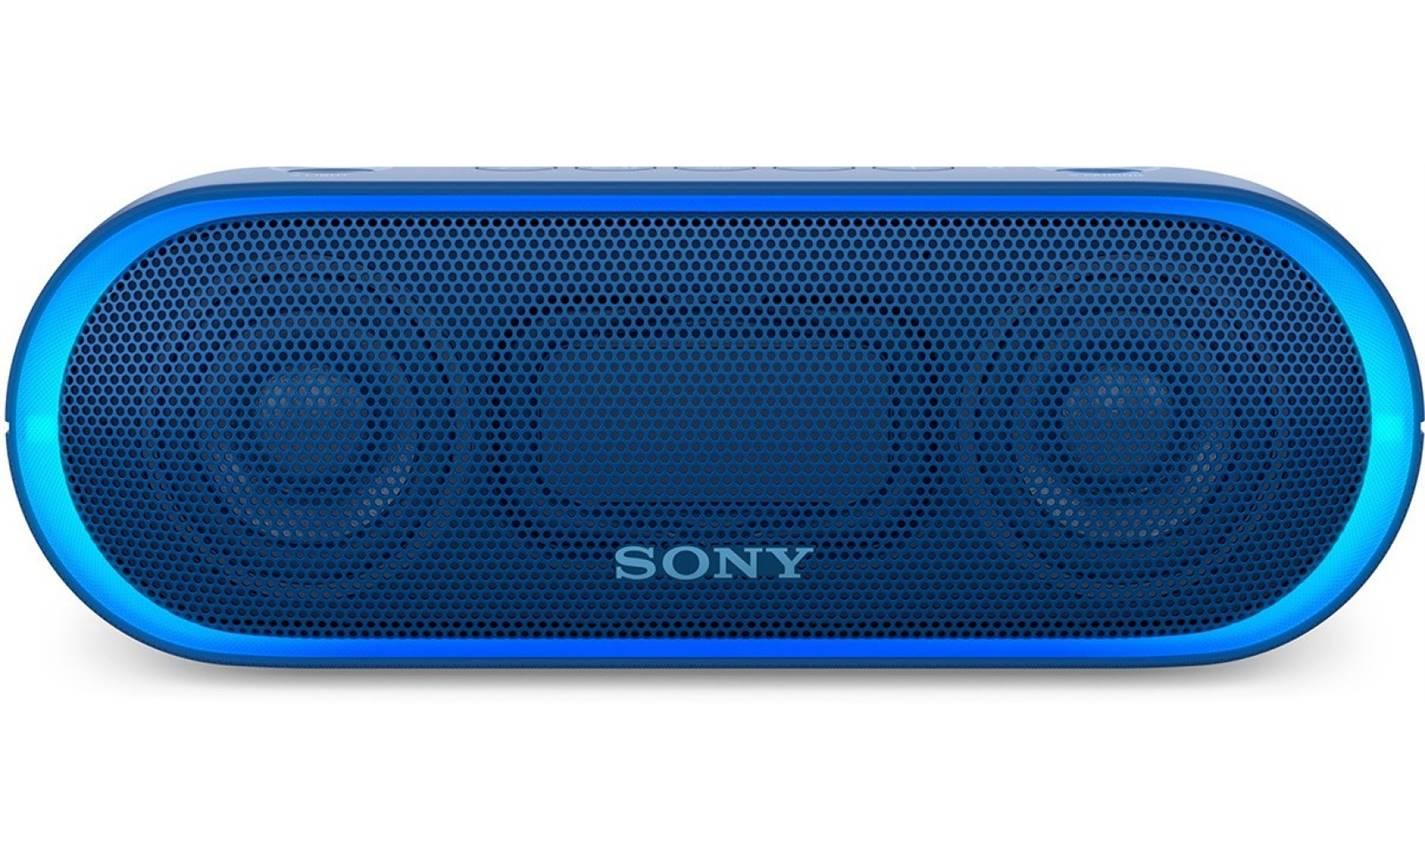 Sony XB20 Speaker